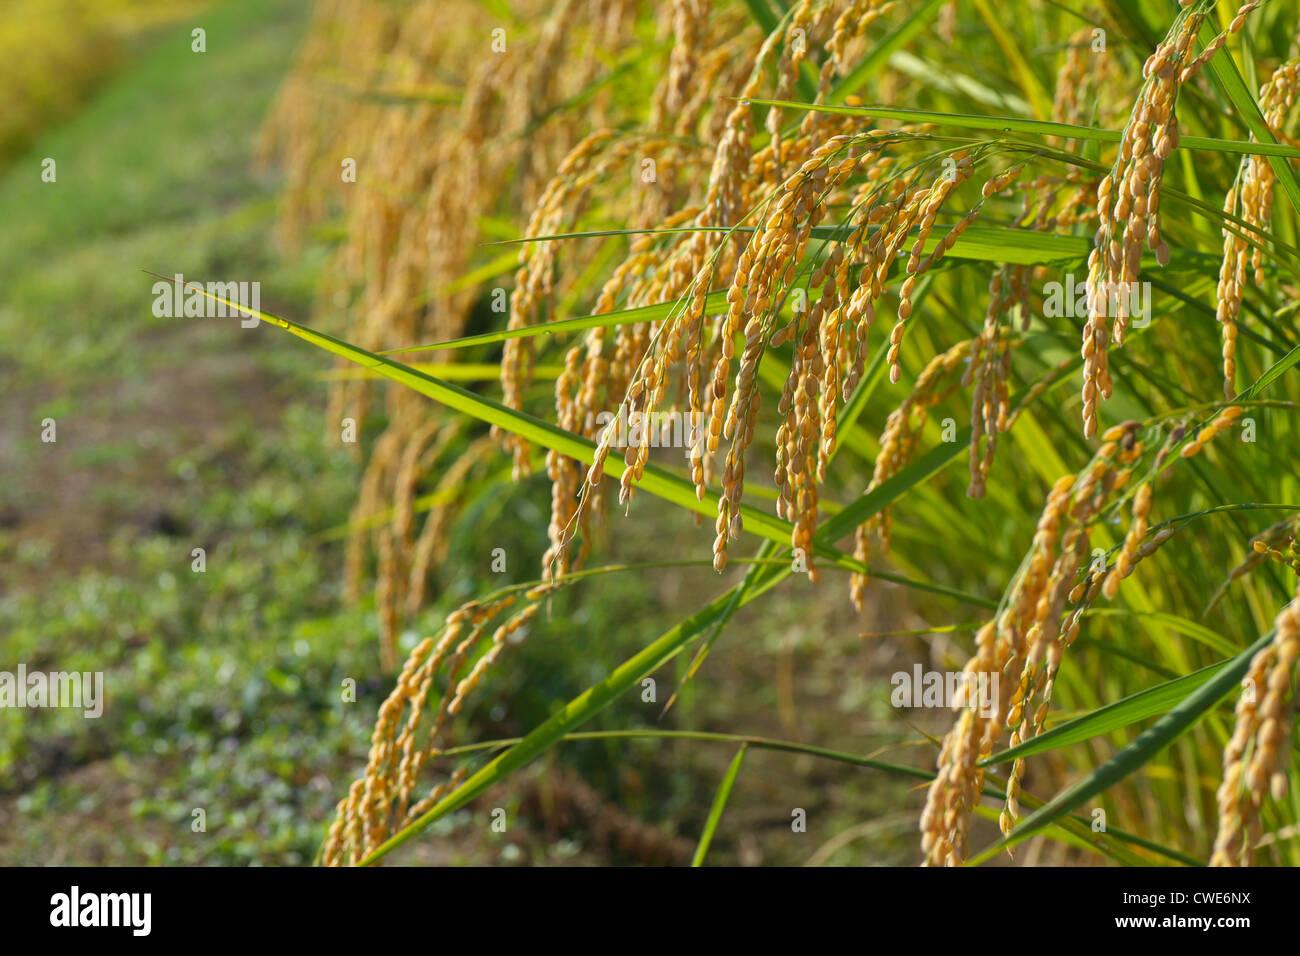 Cropland - Stock Image